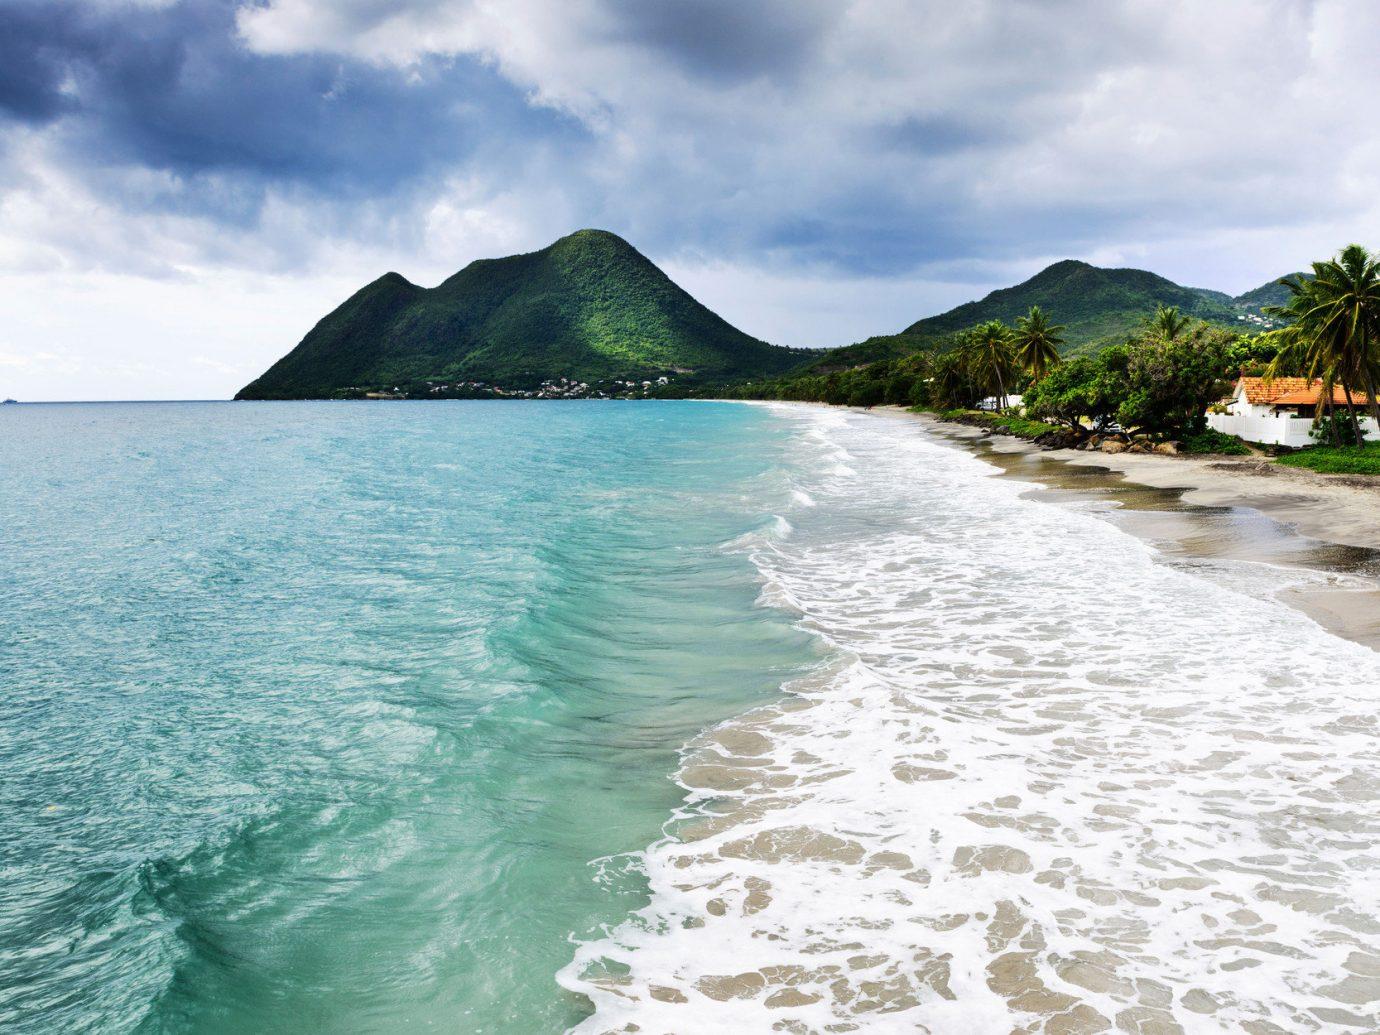 57c78a3d47 Secret Getaways Trip Ideas water sky outdoor Nature Sea Coast landform  Beach shore body of water